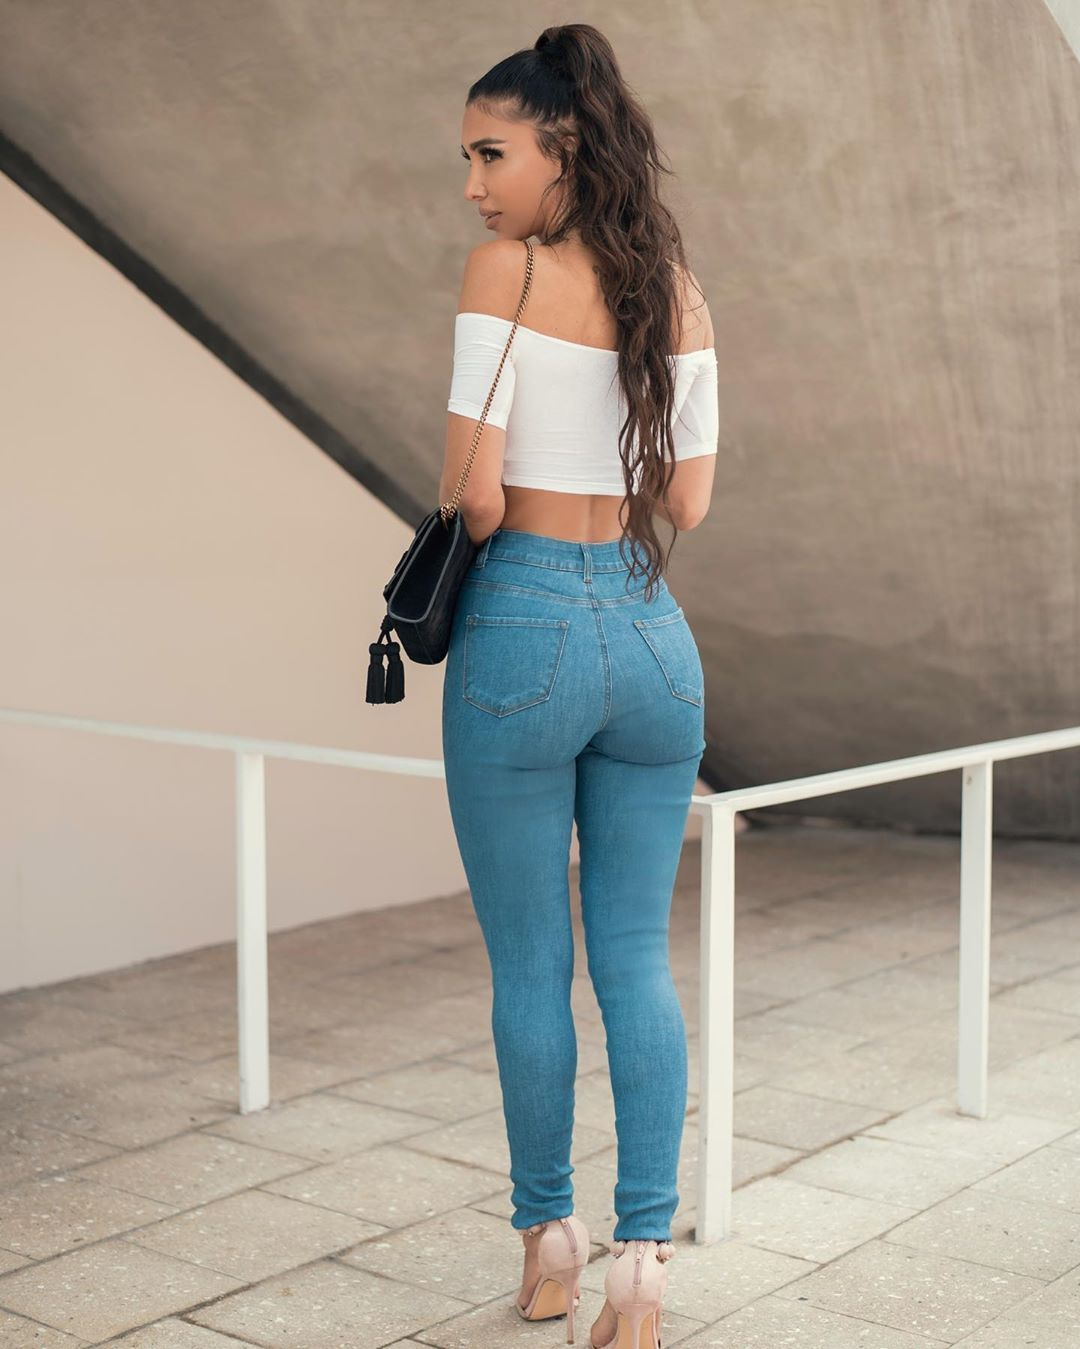 Metisha Schaefer Sexy 0089